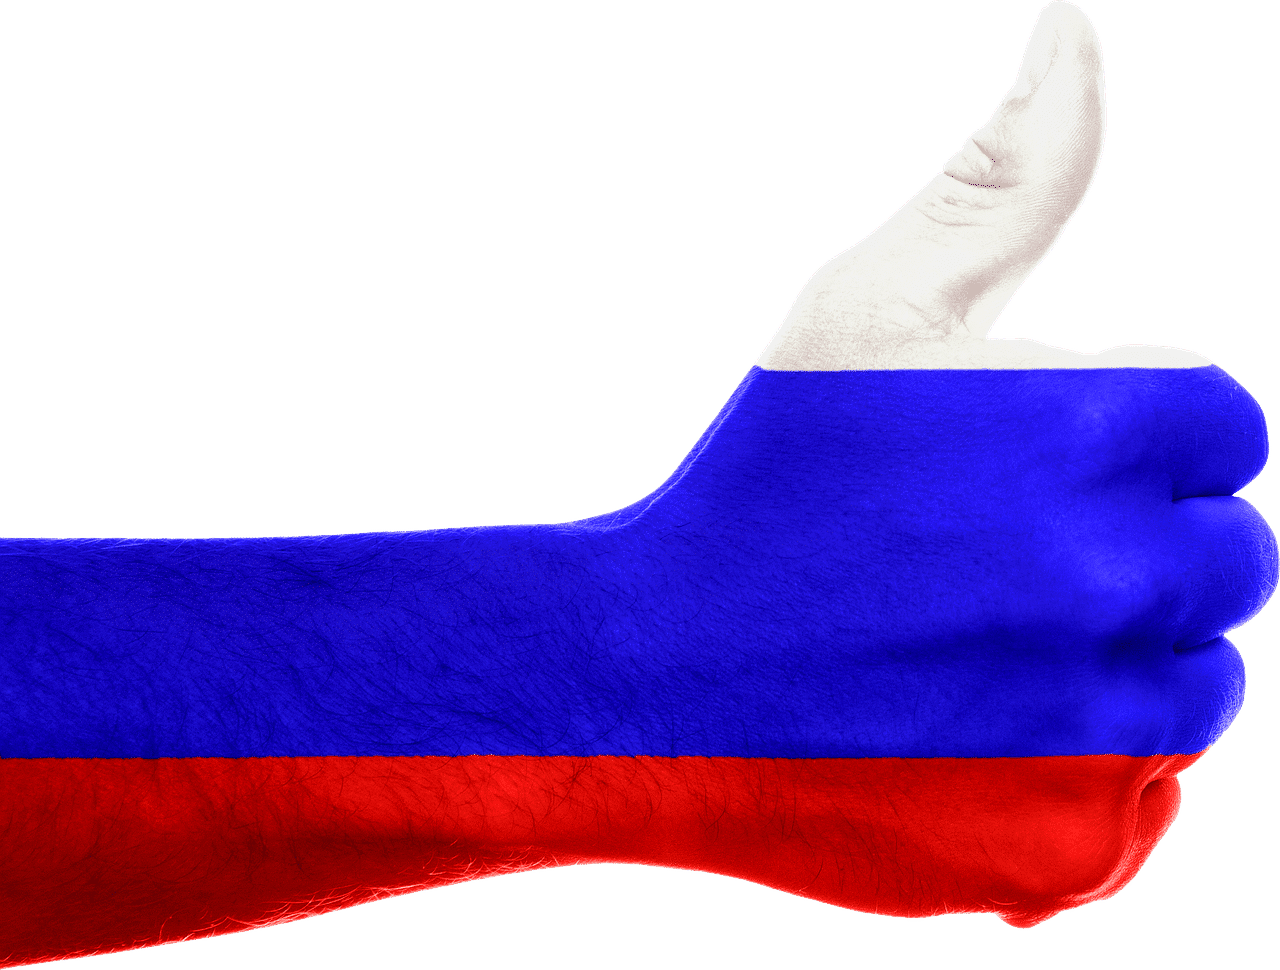 Alpari Obtains Russian Regulatory License, SRO Approval Still Pending